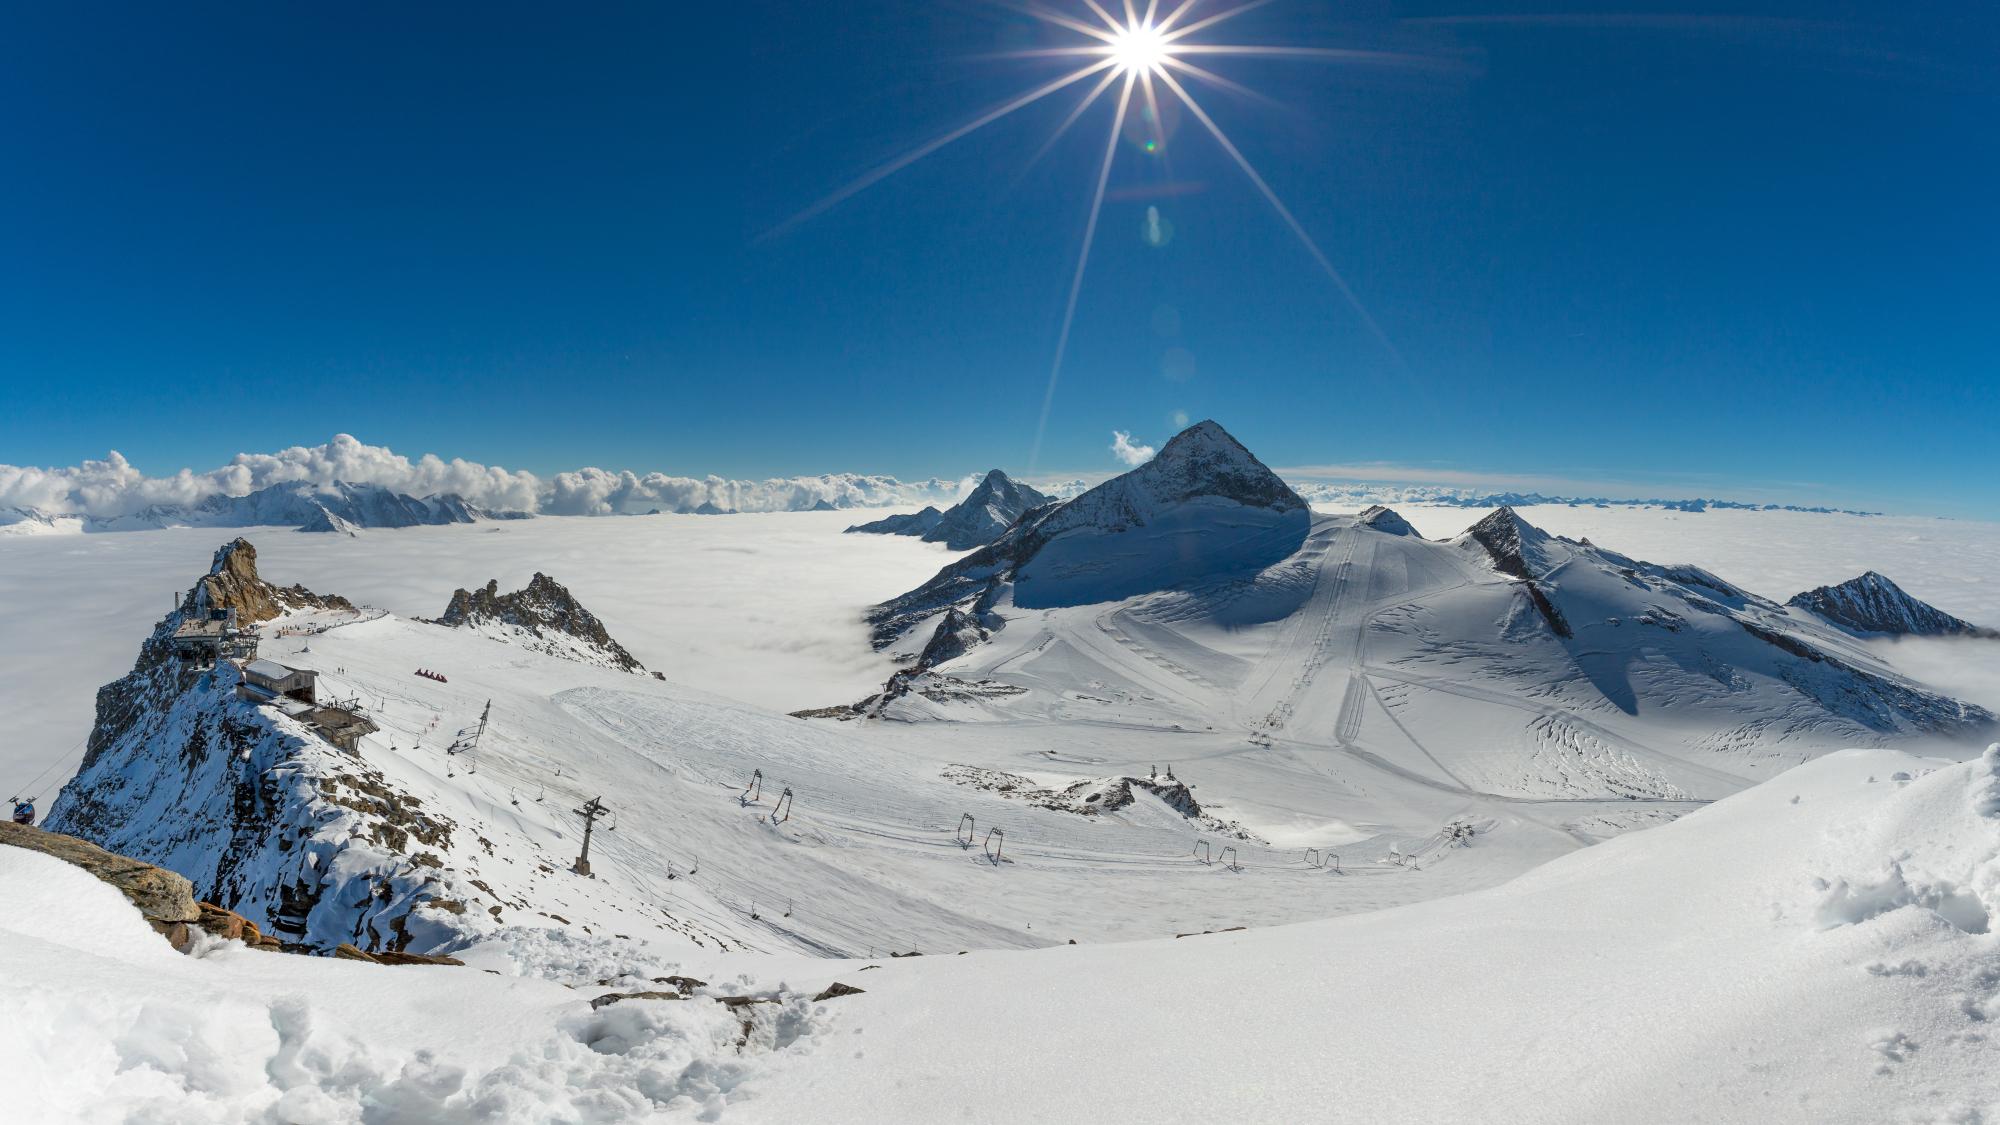 Winterpanorama am Hintertuxer Gletscher